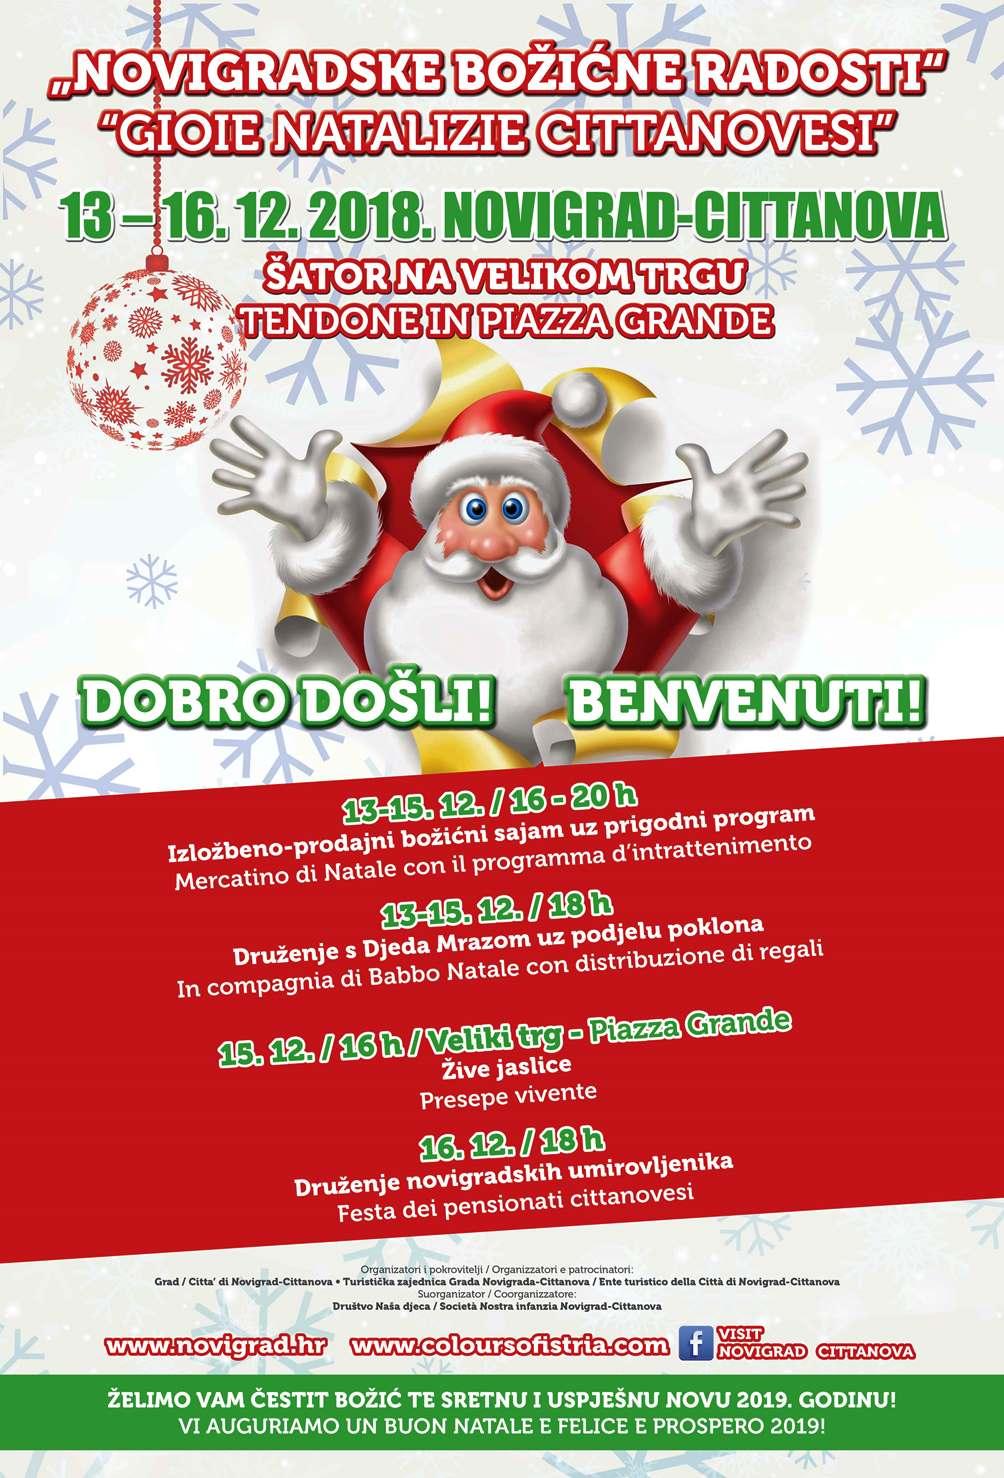 http://www.novigrad.hr/bozhini_sajam_novigradske_bozhine_radosti3